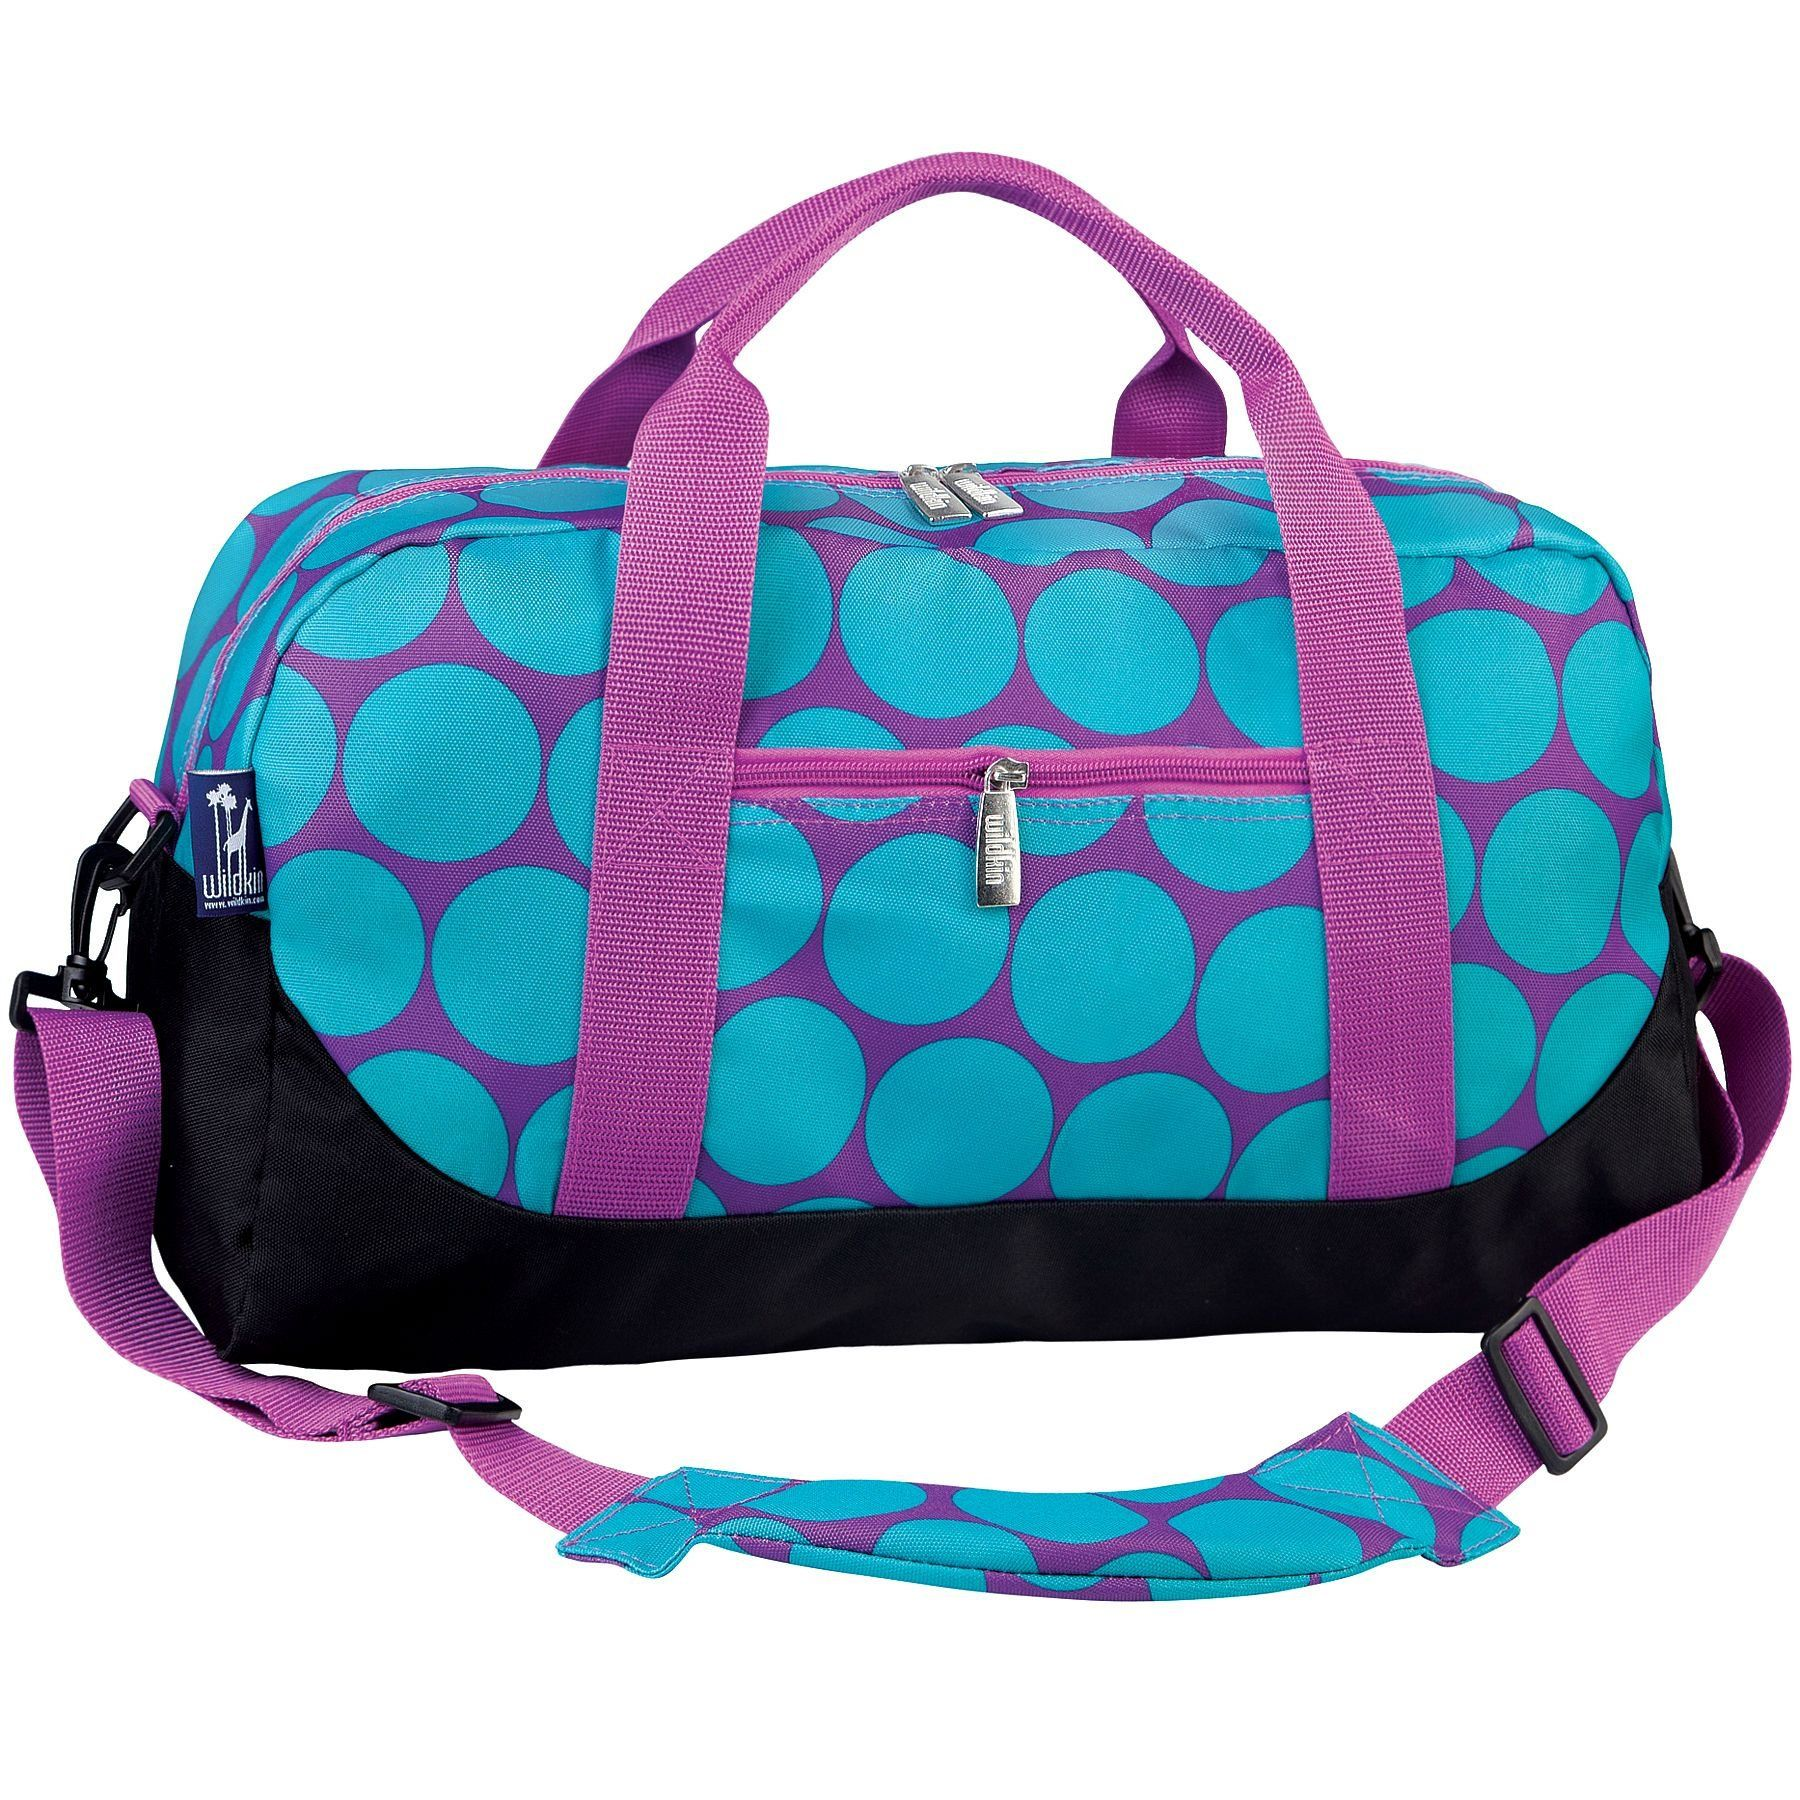 Personalized Girls Luggage Custom Duffle Bag Overnight Bag Kids